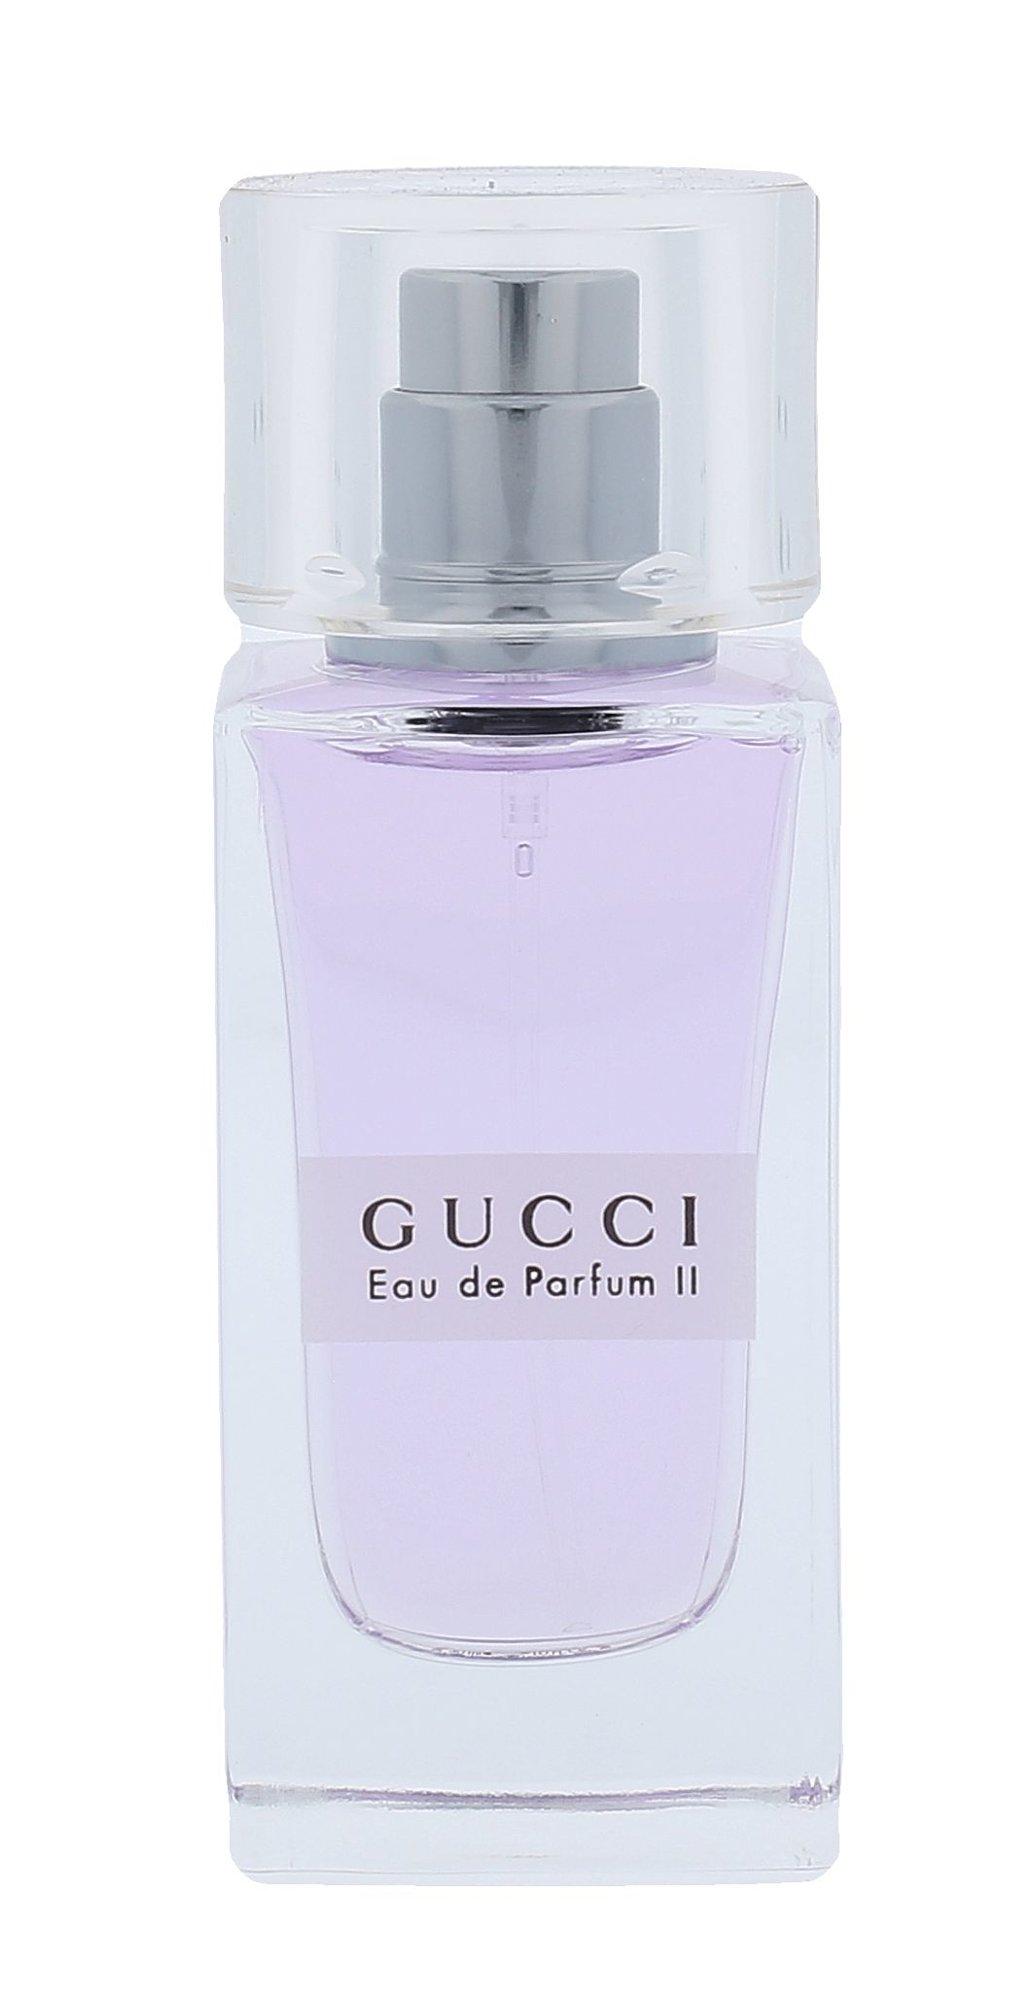 Gucci Eau de Parfum II. EDP 30ml